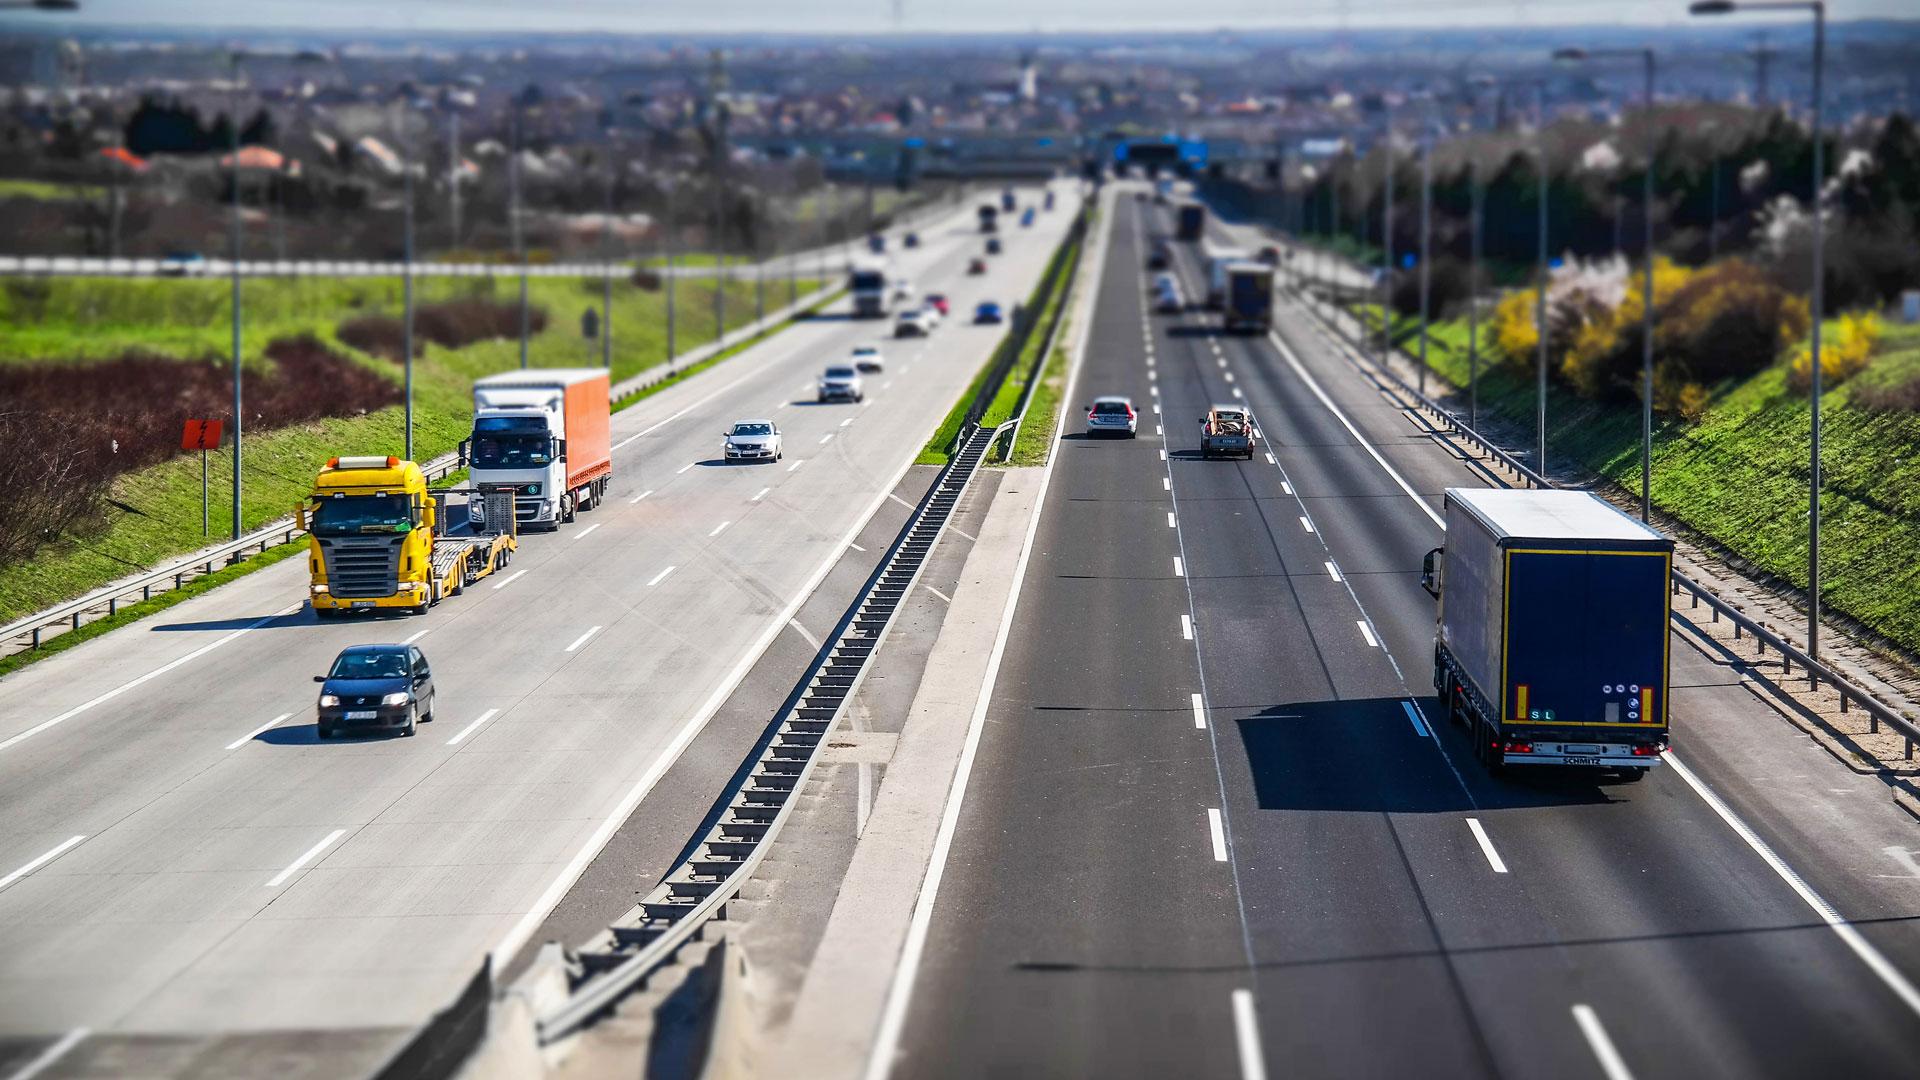 viabilita-traffico-trasporti